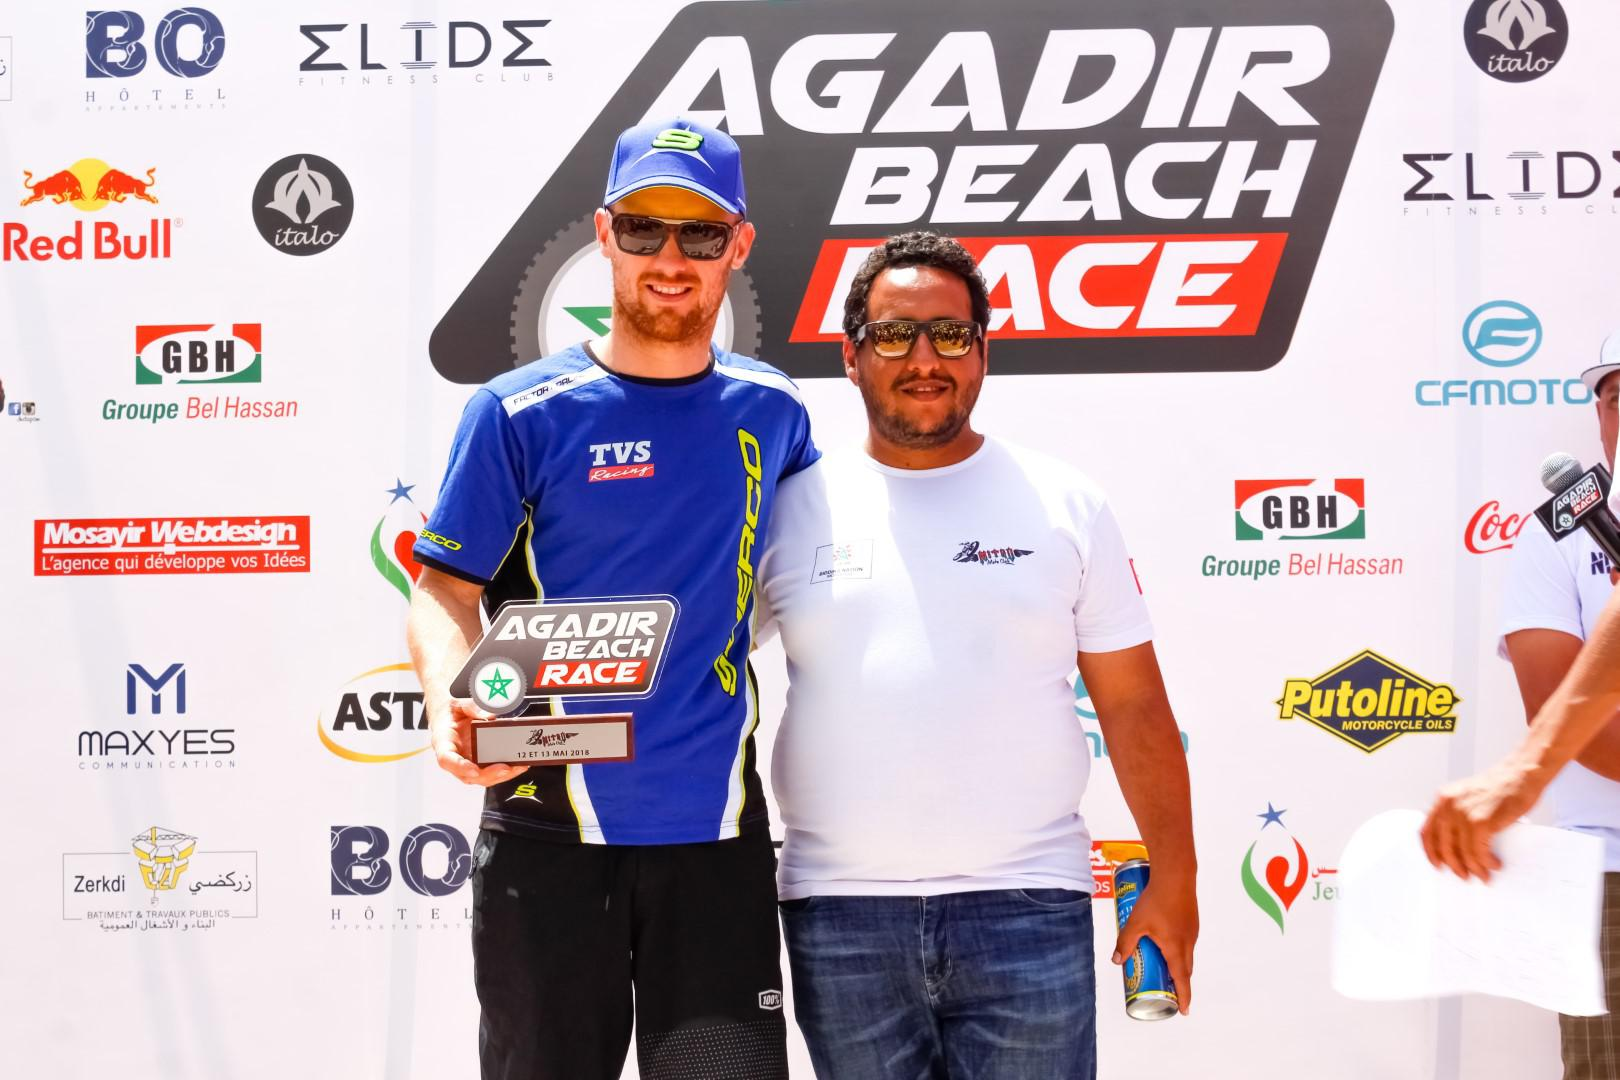 agadir-beach-race-la-reussite-791-2.jpg